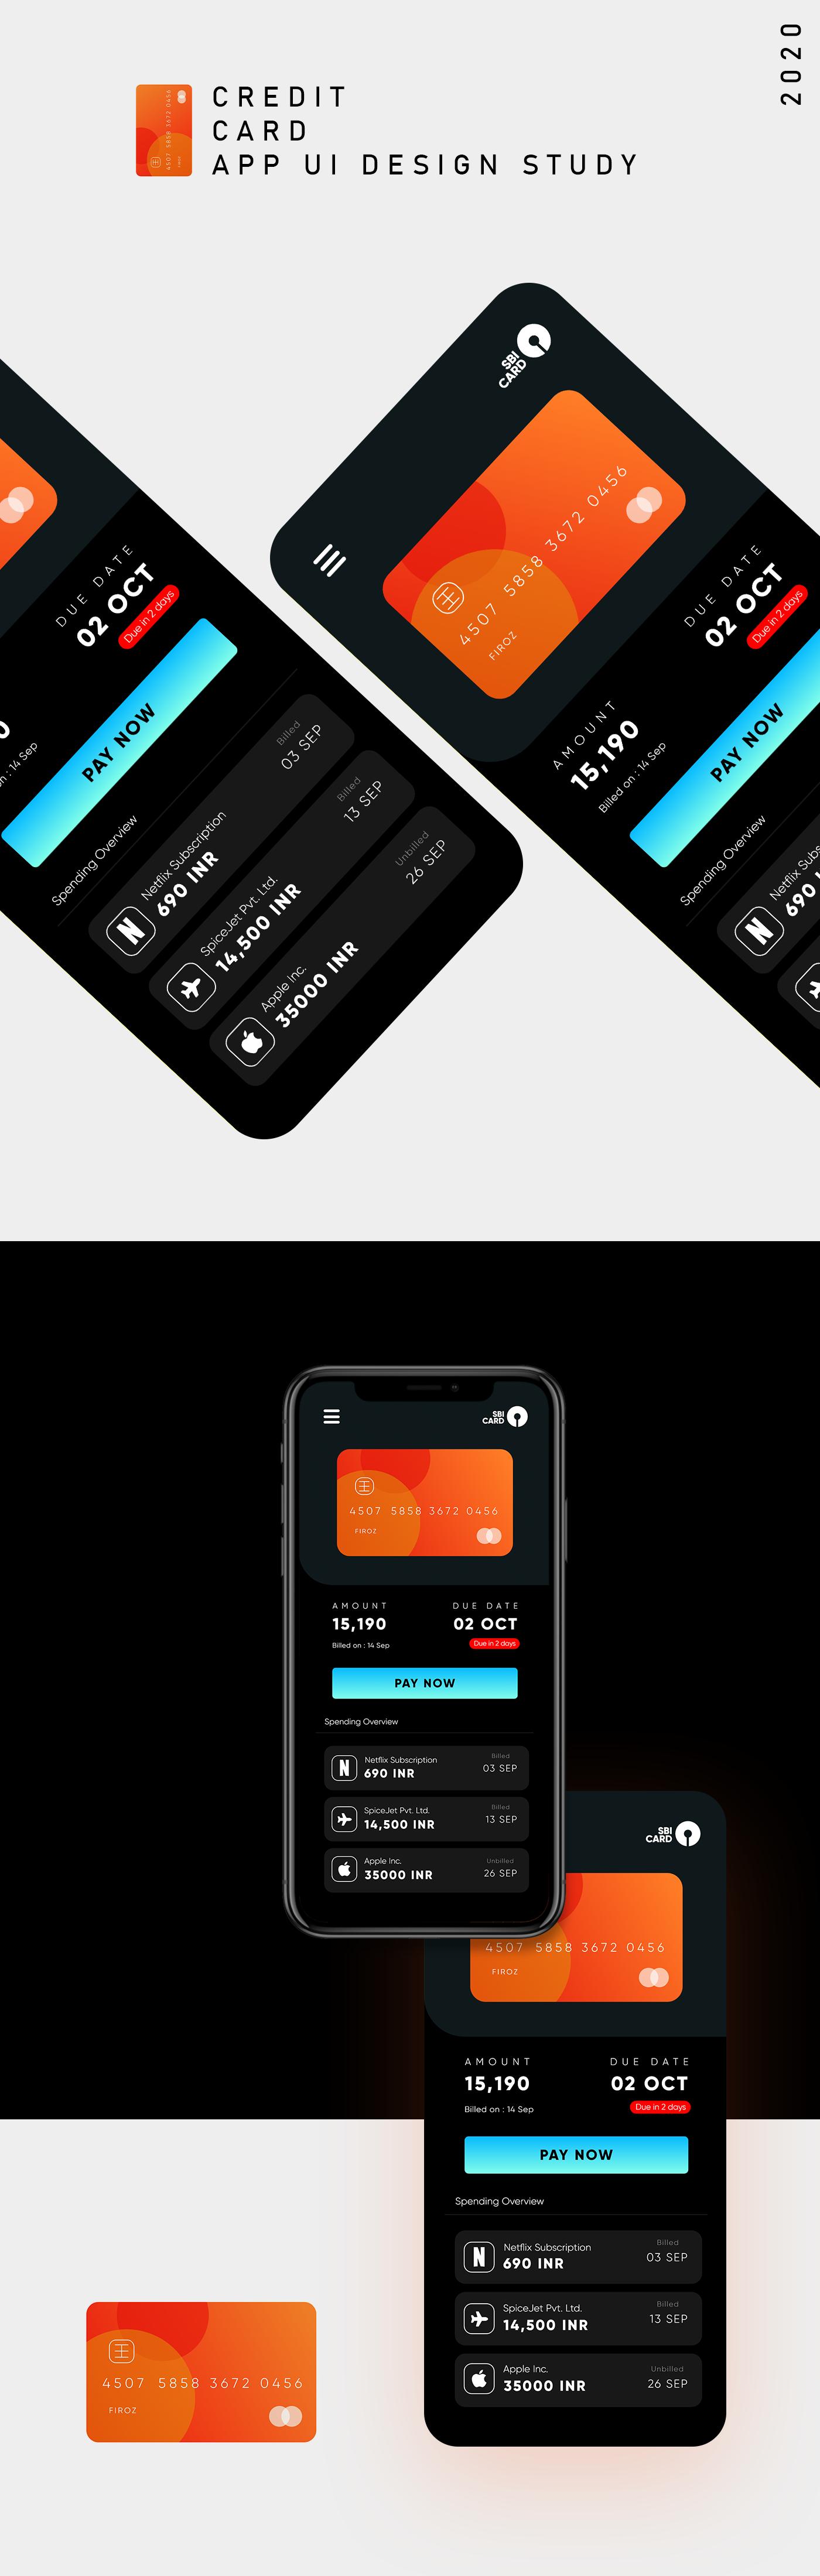 adobexd app design bank app  creditcard Interfce UI uidesign ux